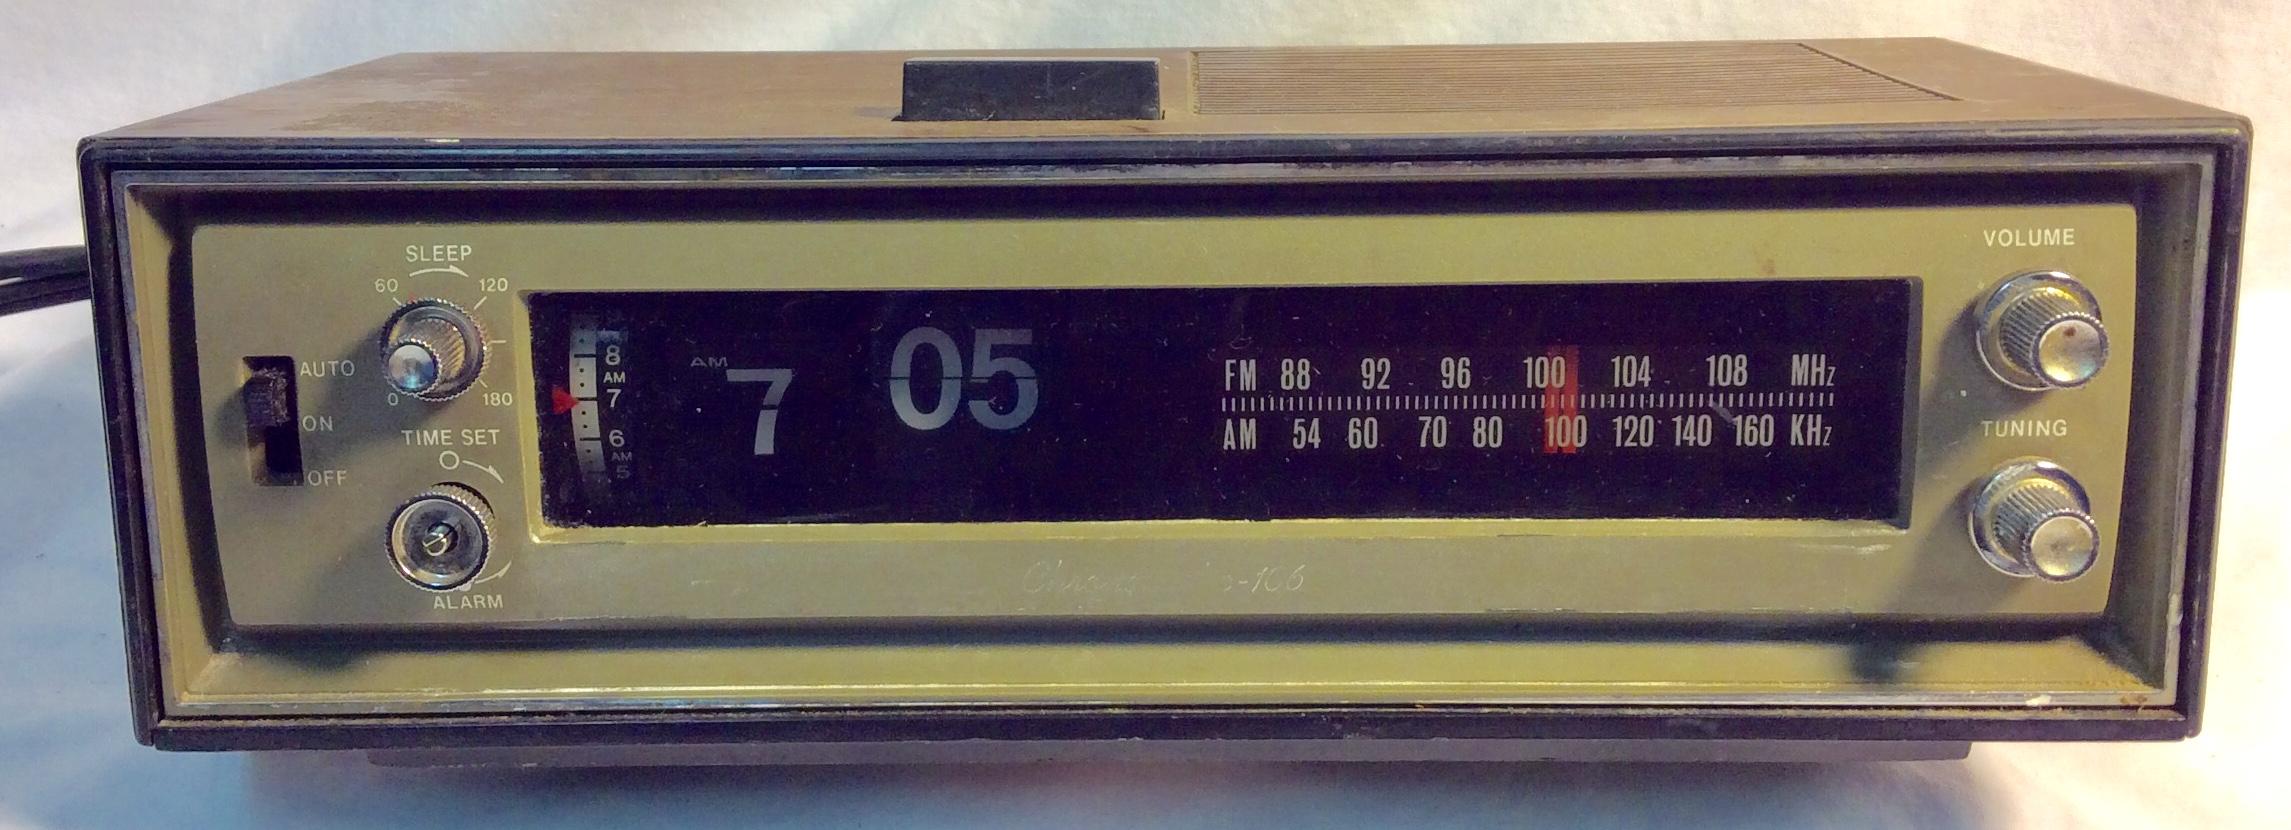 Rigged - vintage flip alarm clock